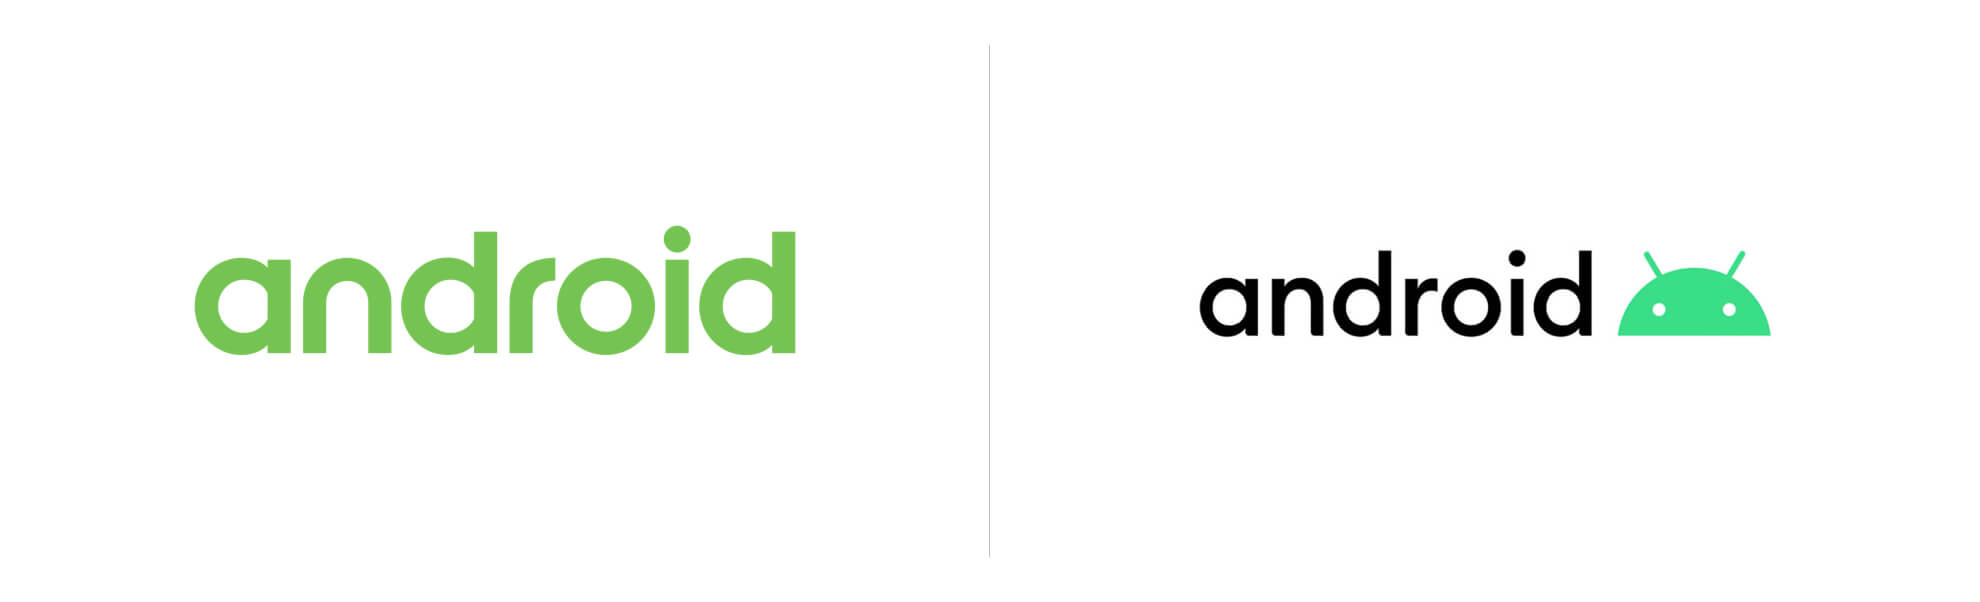 Stare inowe logo Androida